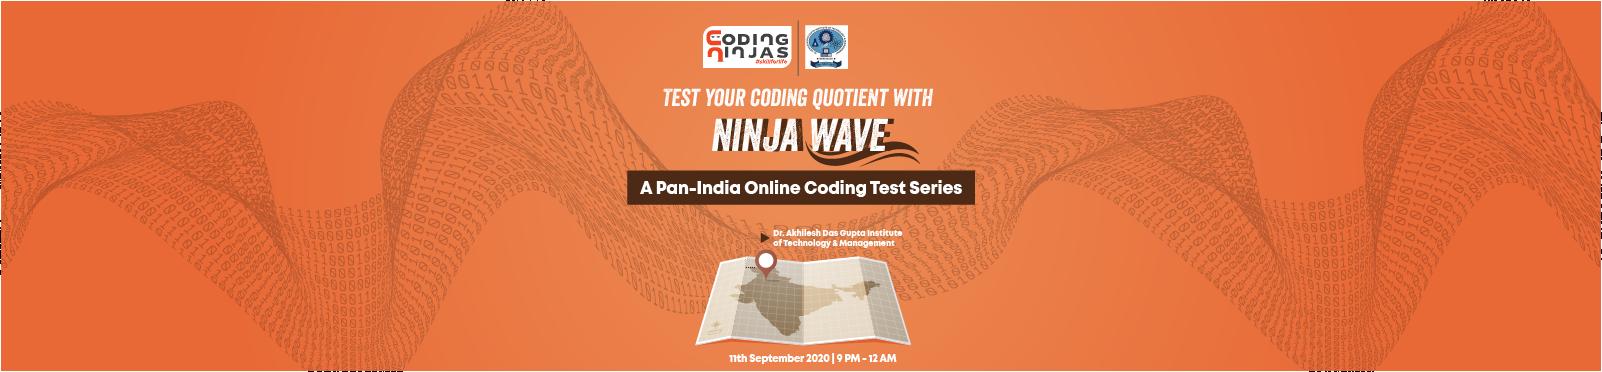 Ninja Wave at Dr. Akhilesh Das Gupta Institute of Engineering & Technology